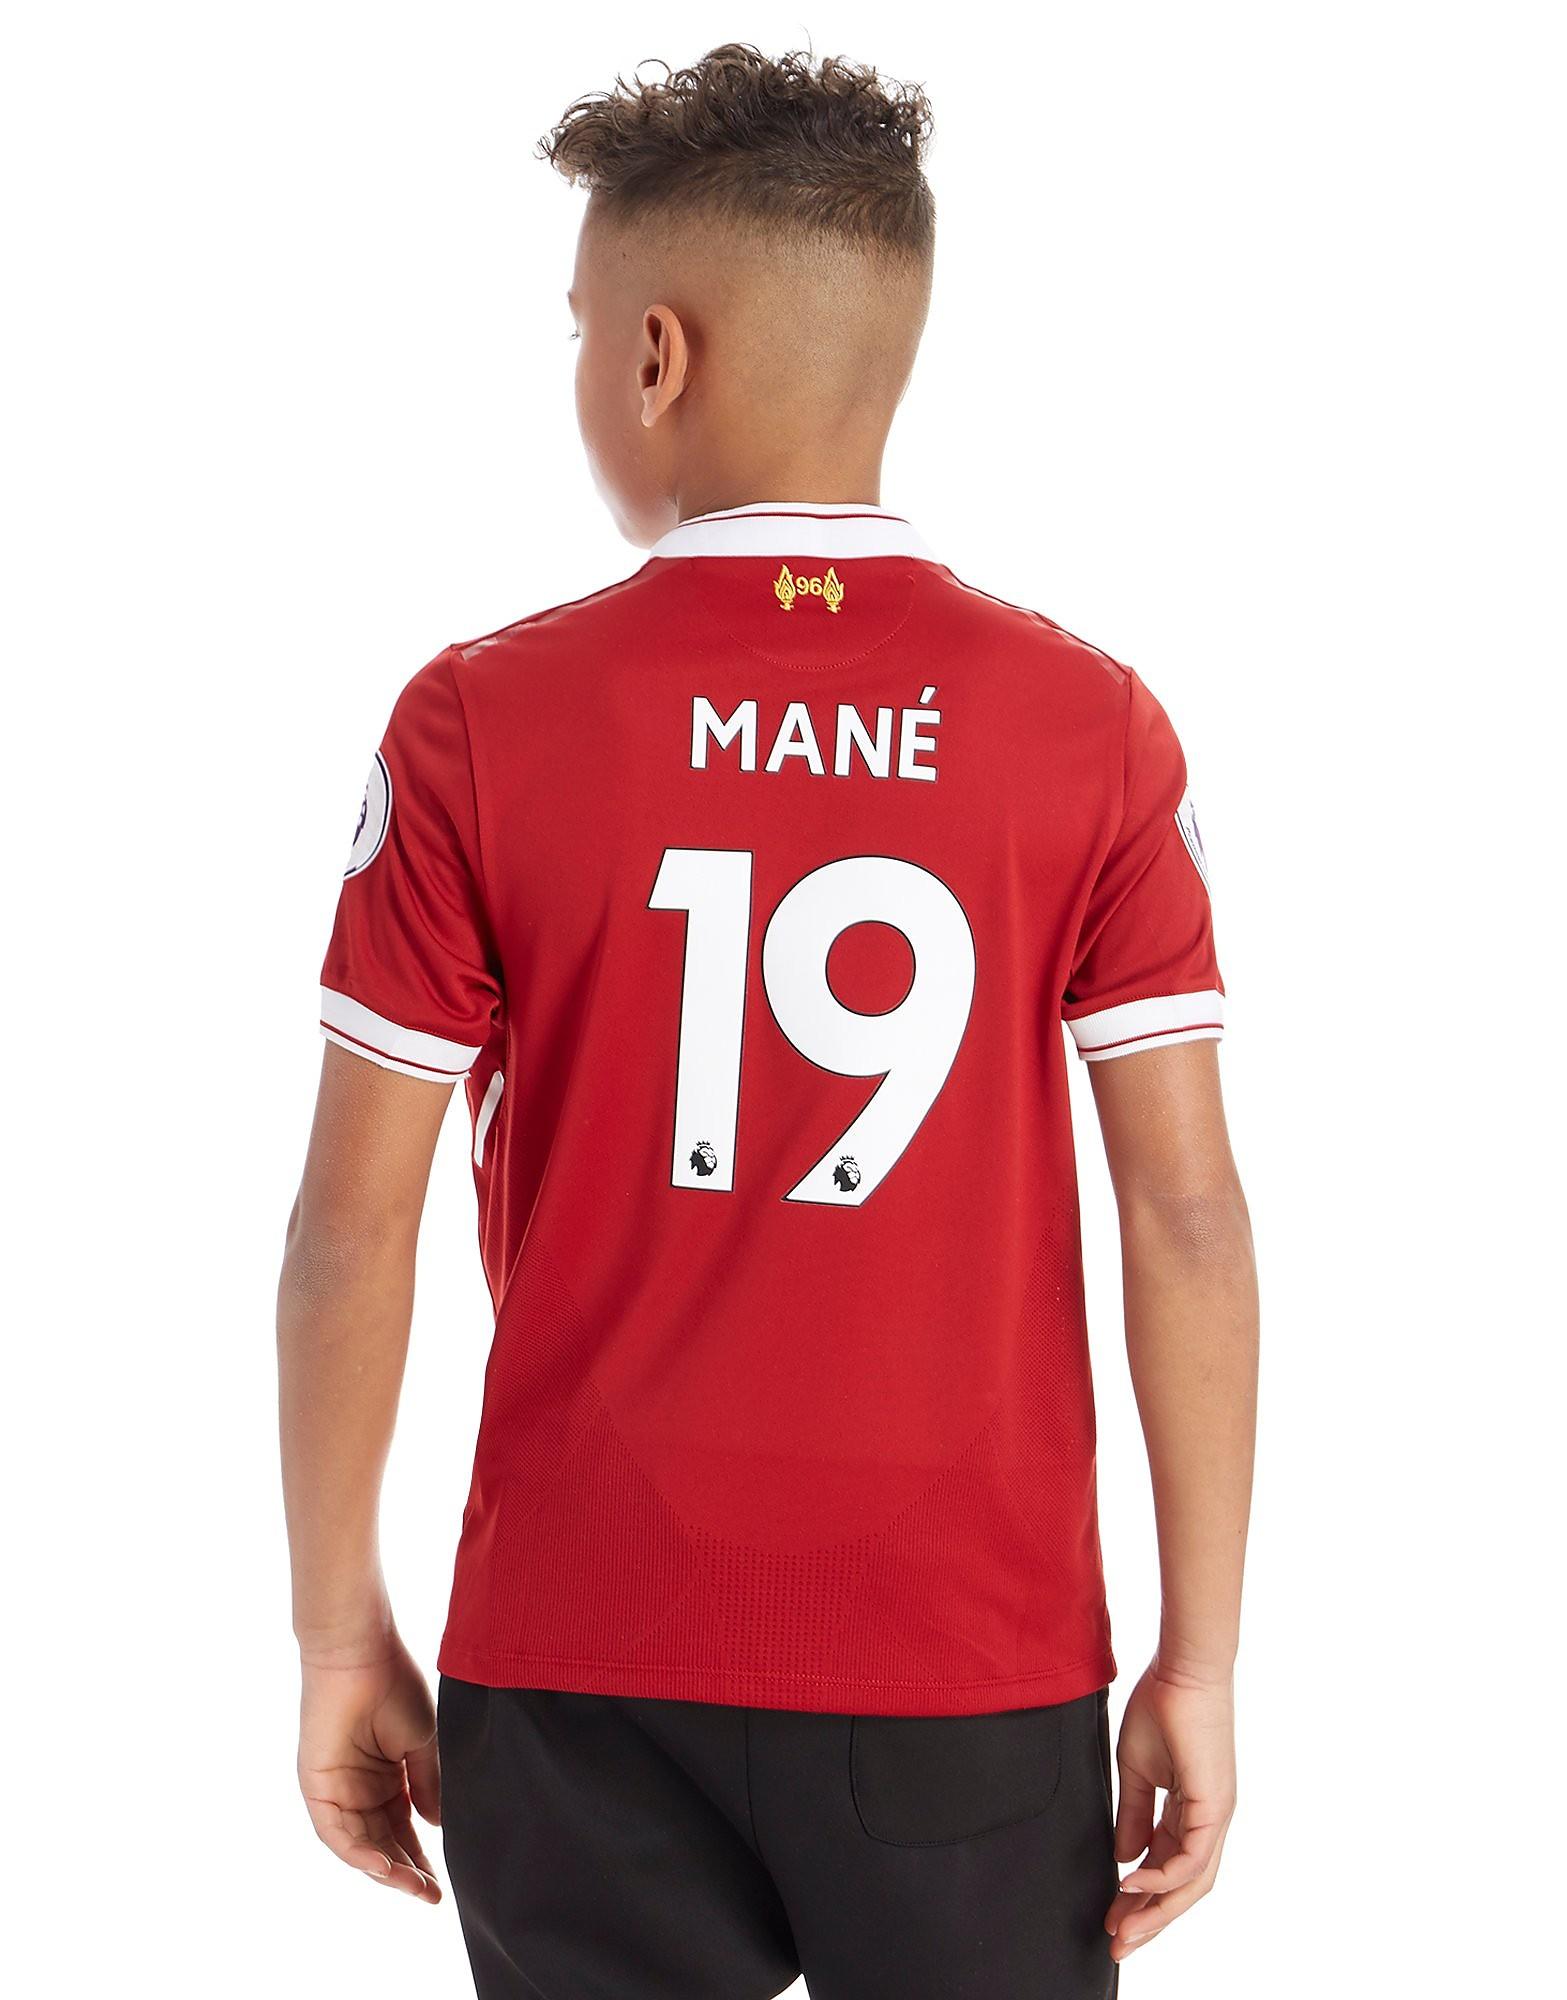 New Balance Liverpool FC 2017 Mane #19 Home Shirt Junior